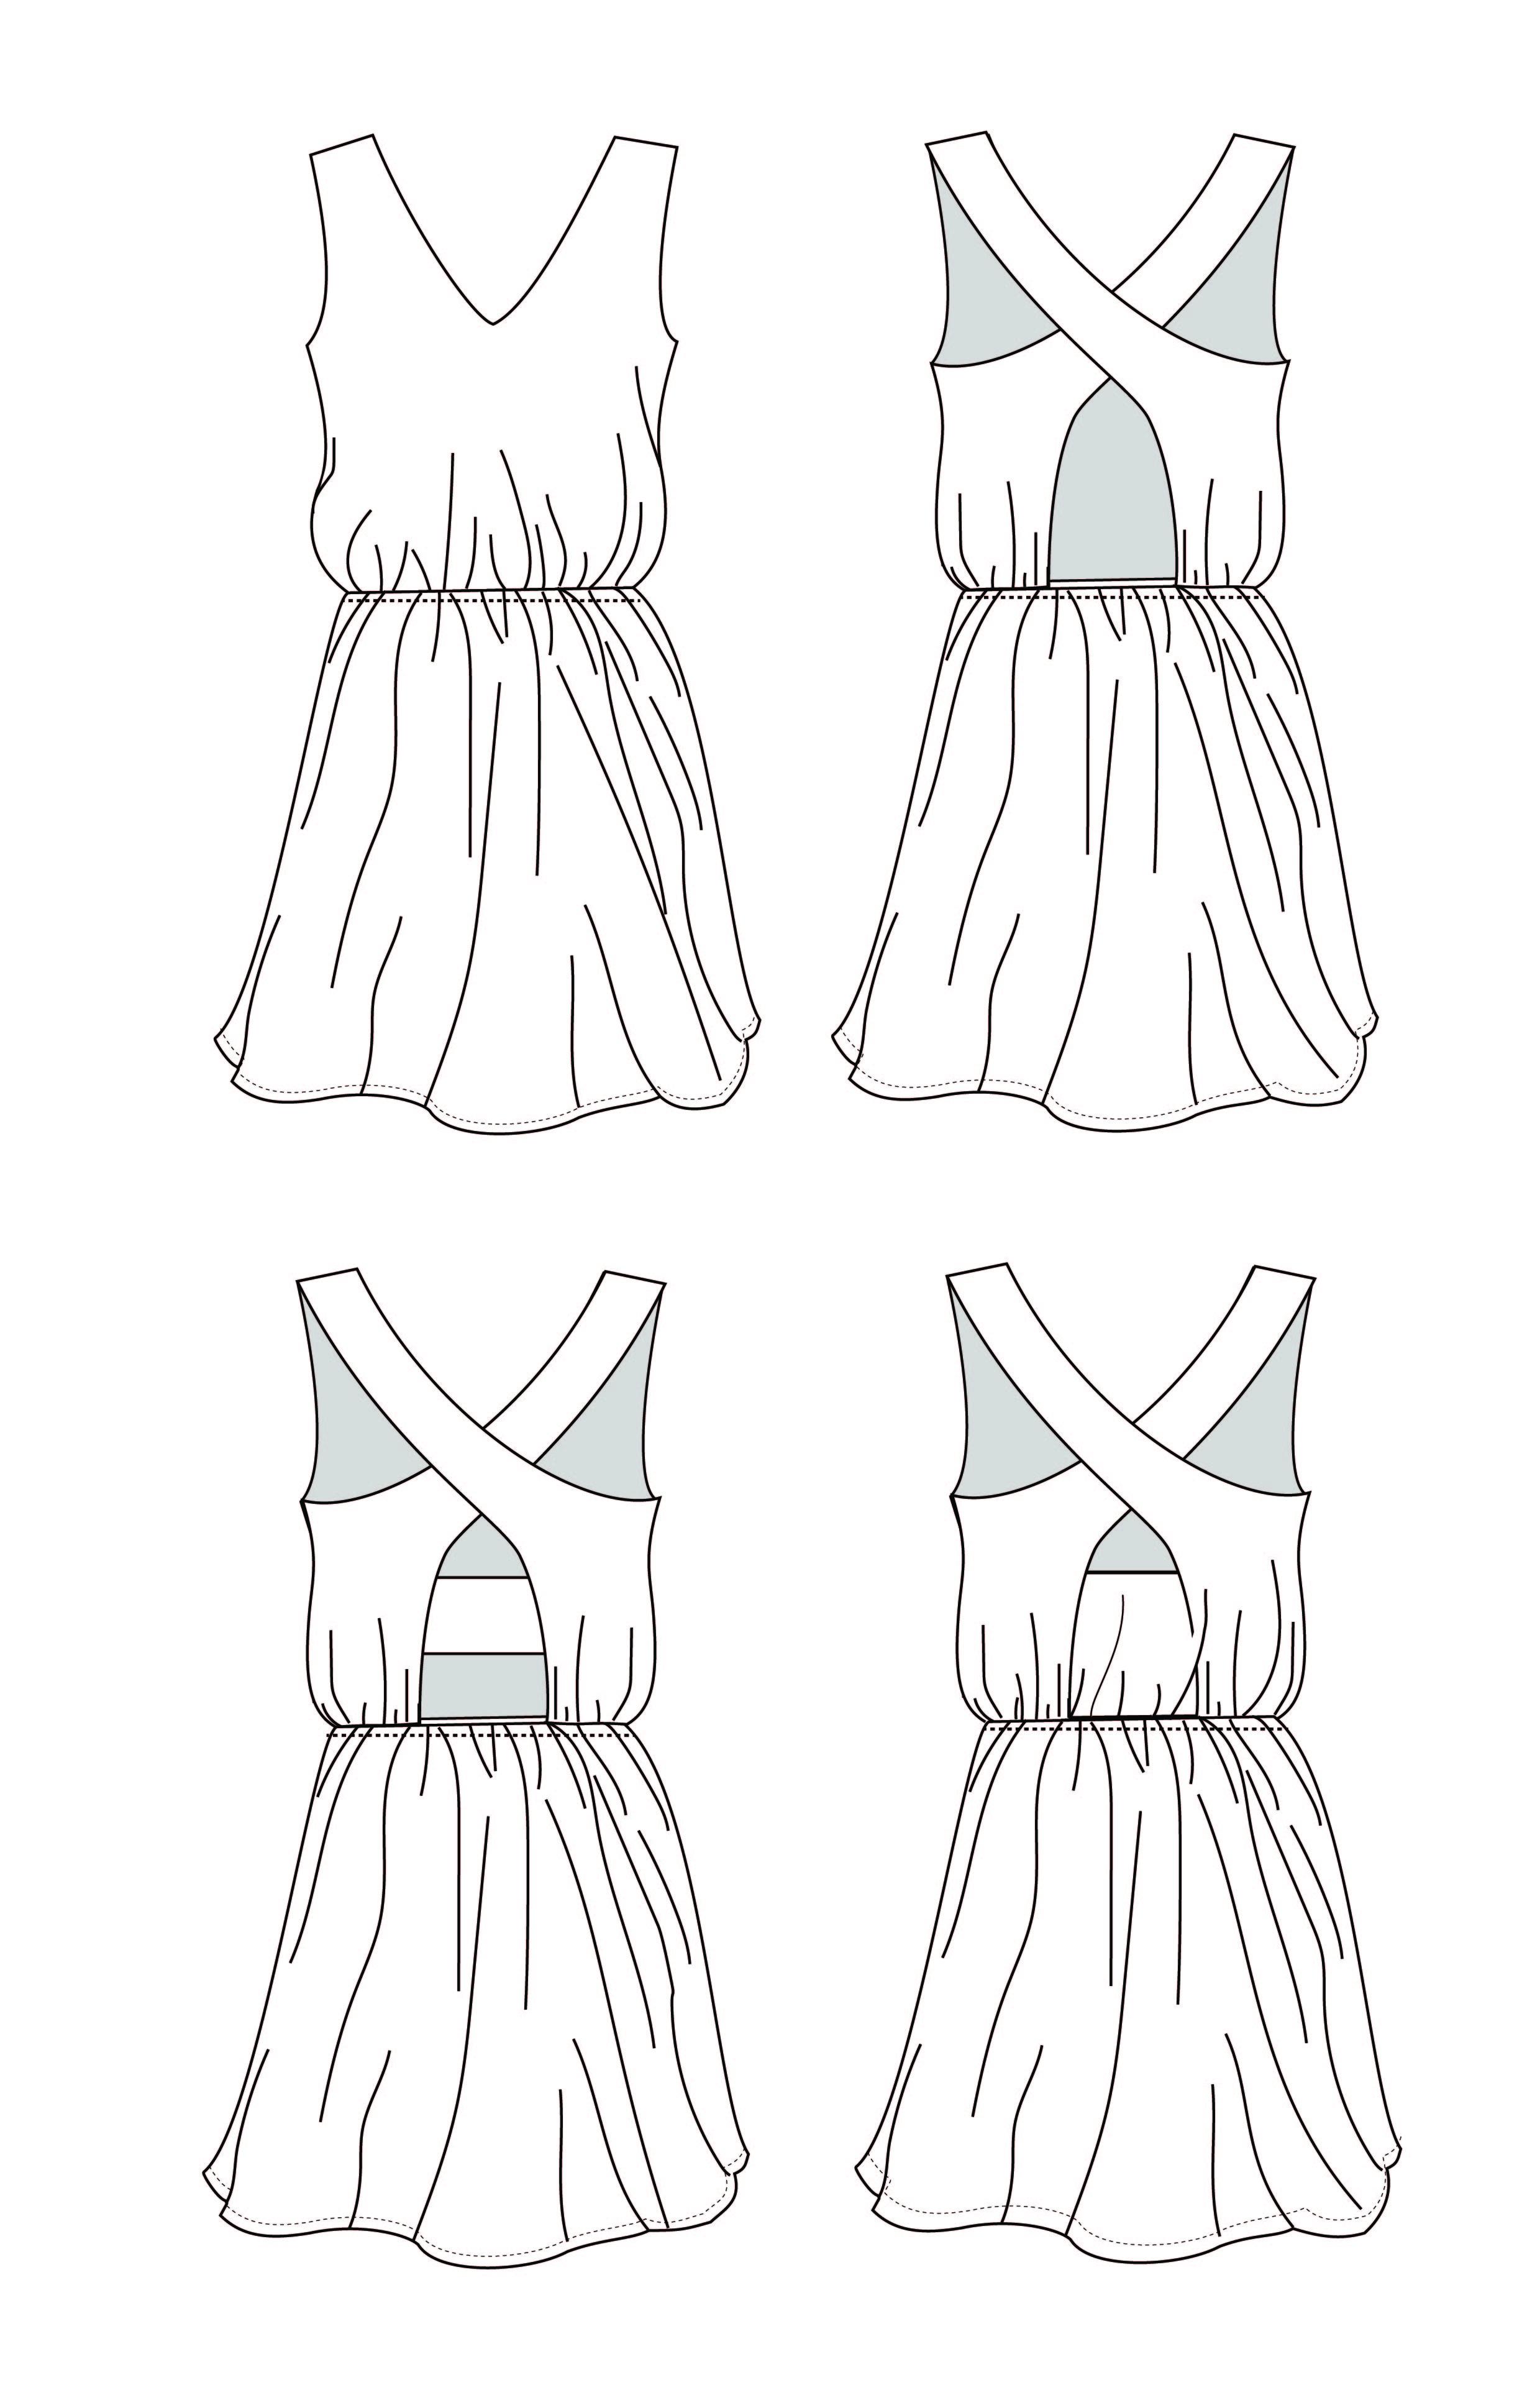 VESTIDO DARLILA patron de costura - sewing - upcycling - pattern making